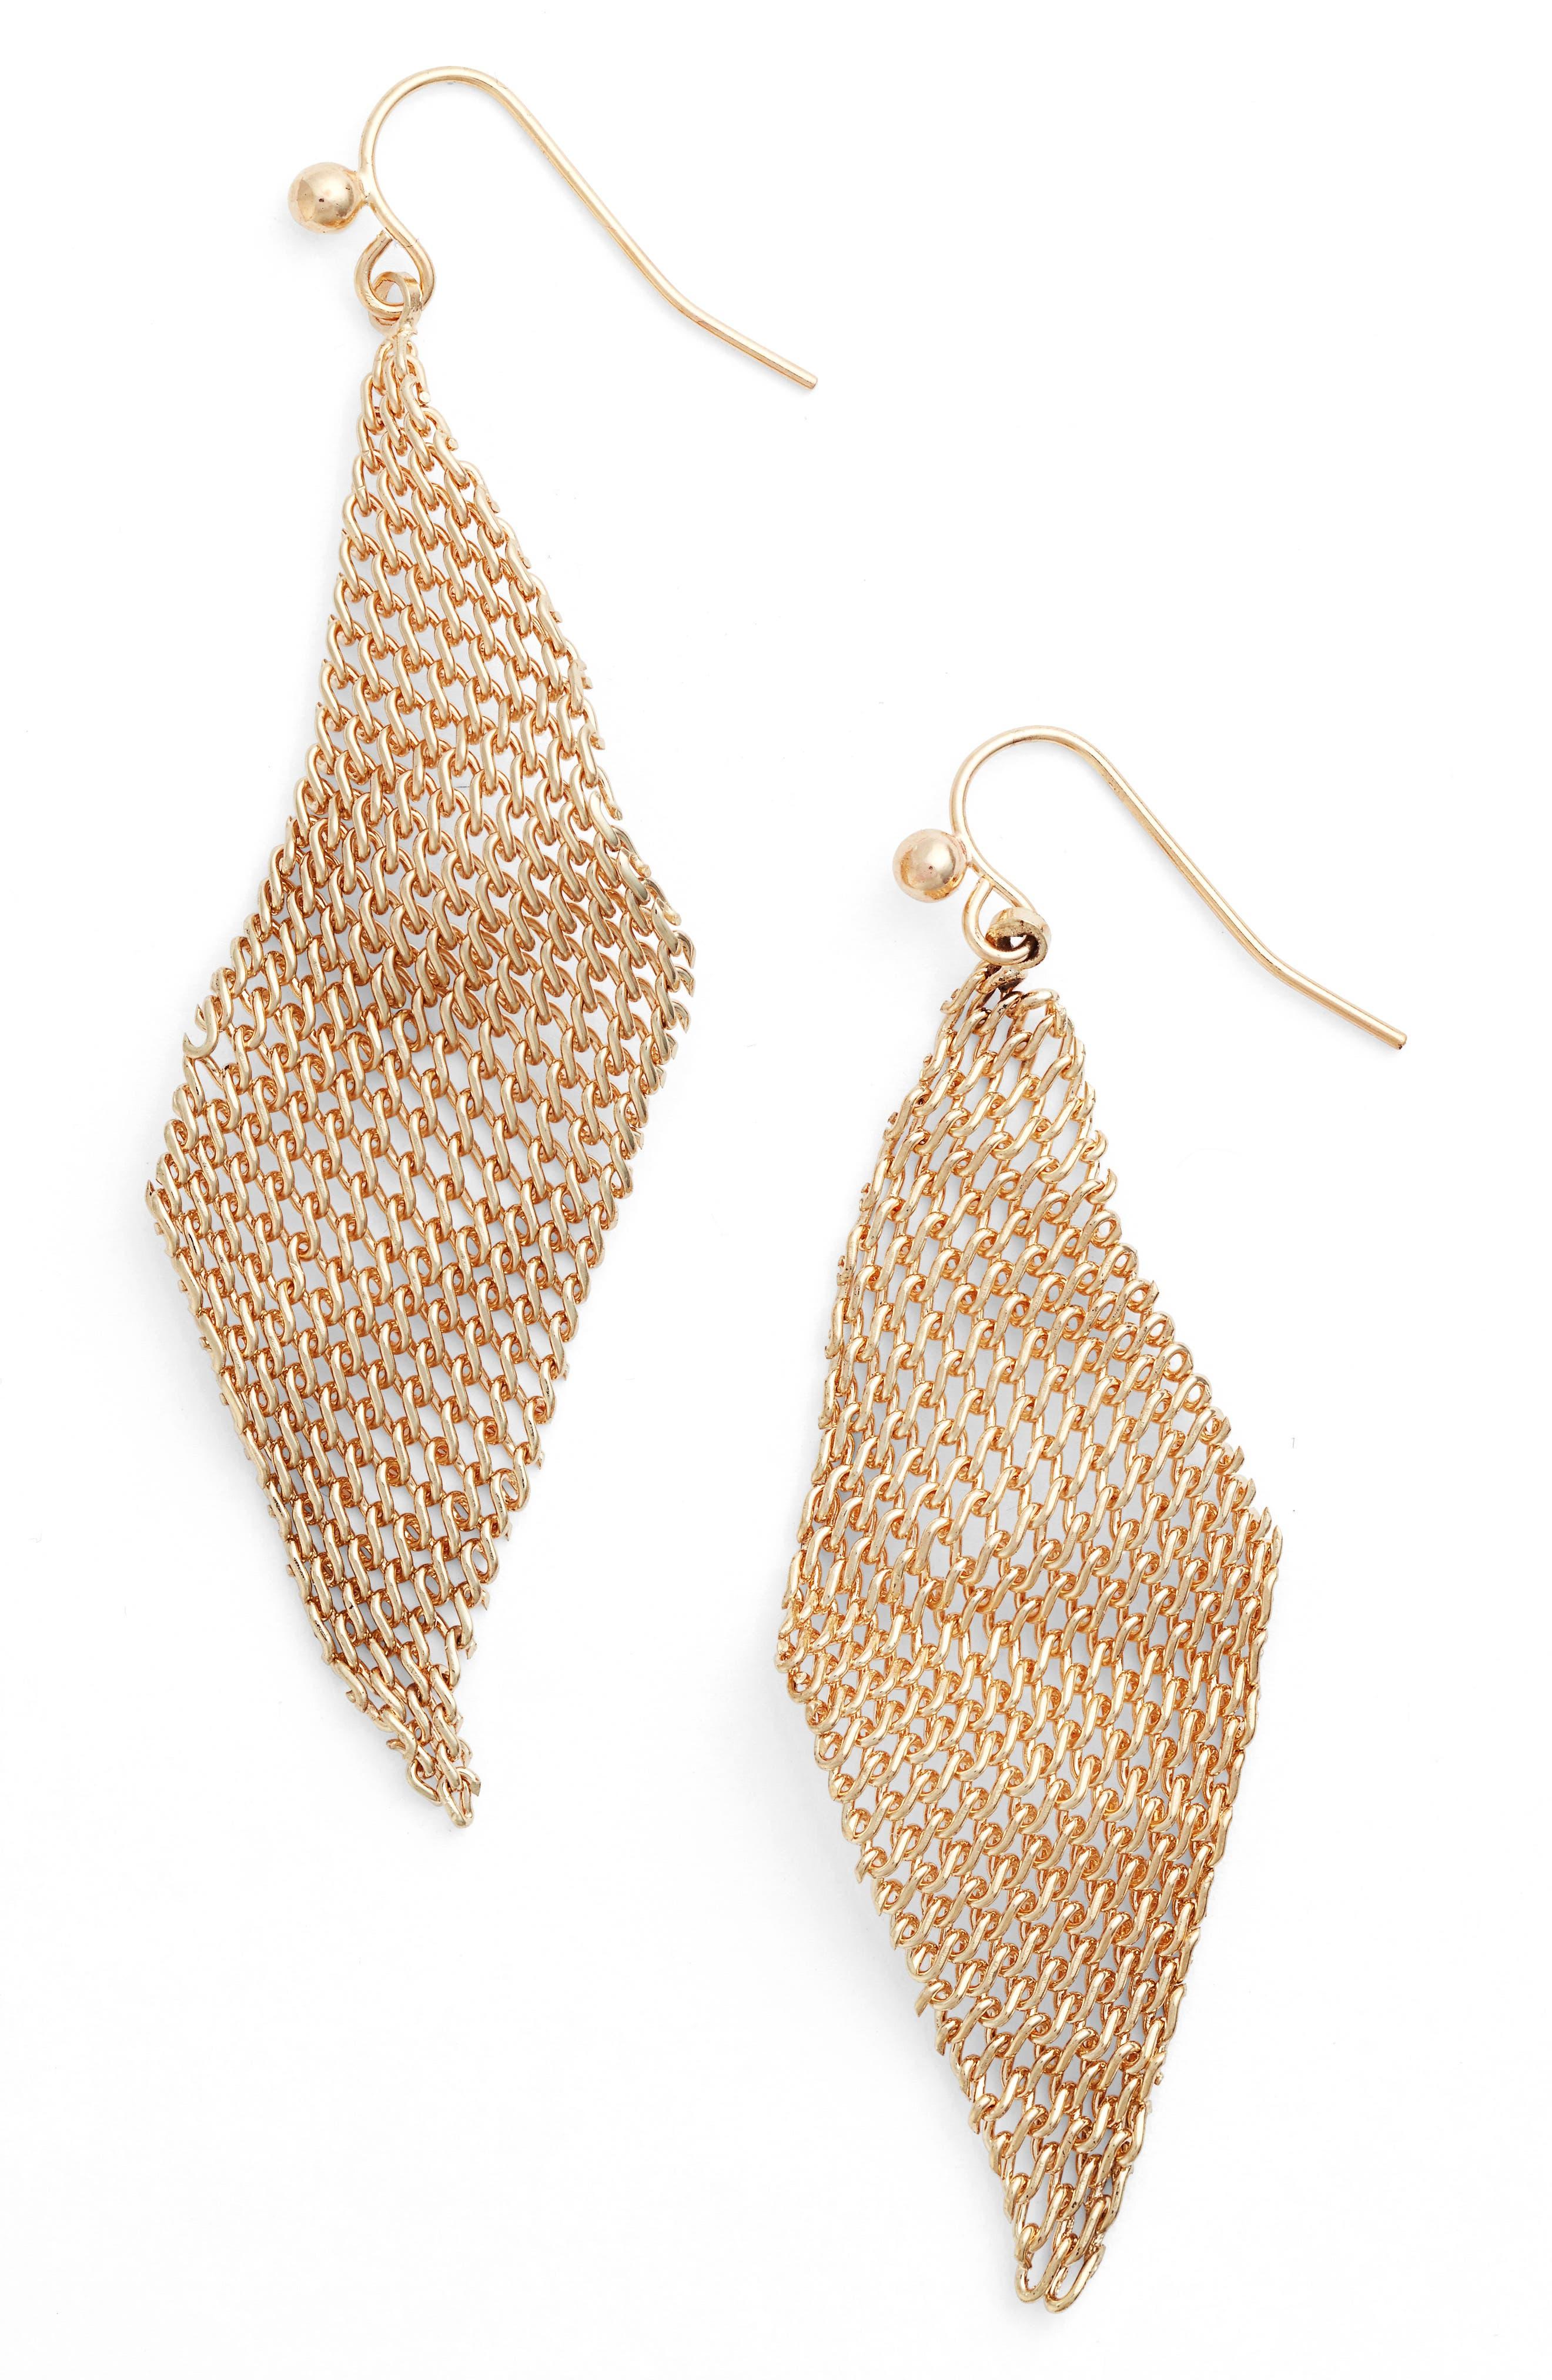 Mesh Wave Kite Earrings,                             Main thumbnail 1, color,                             Gold